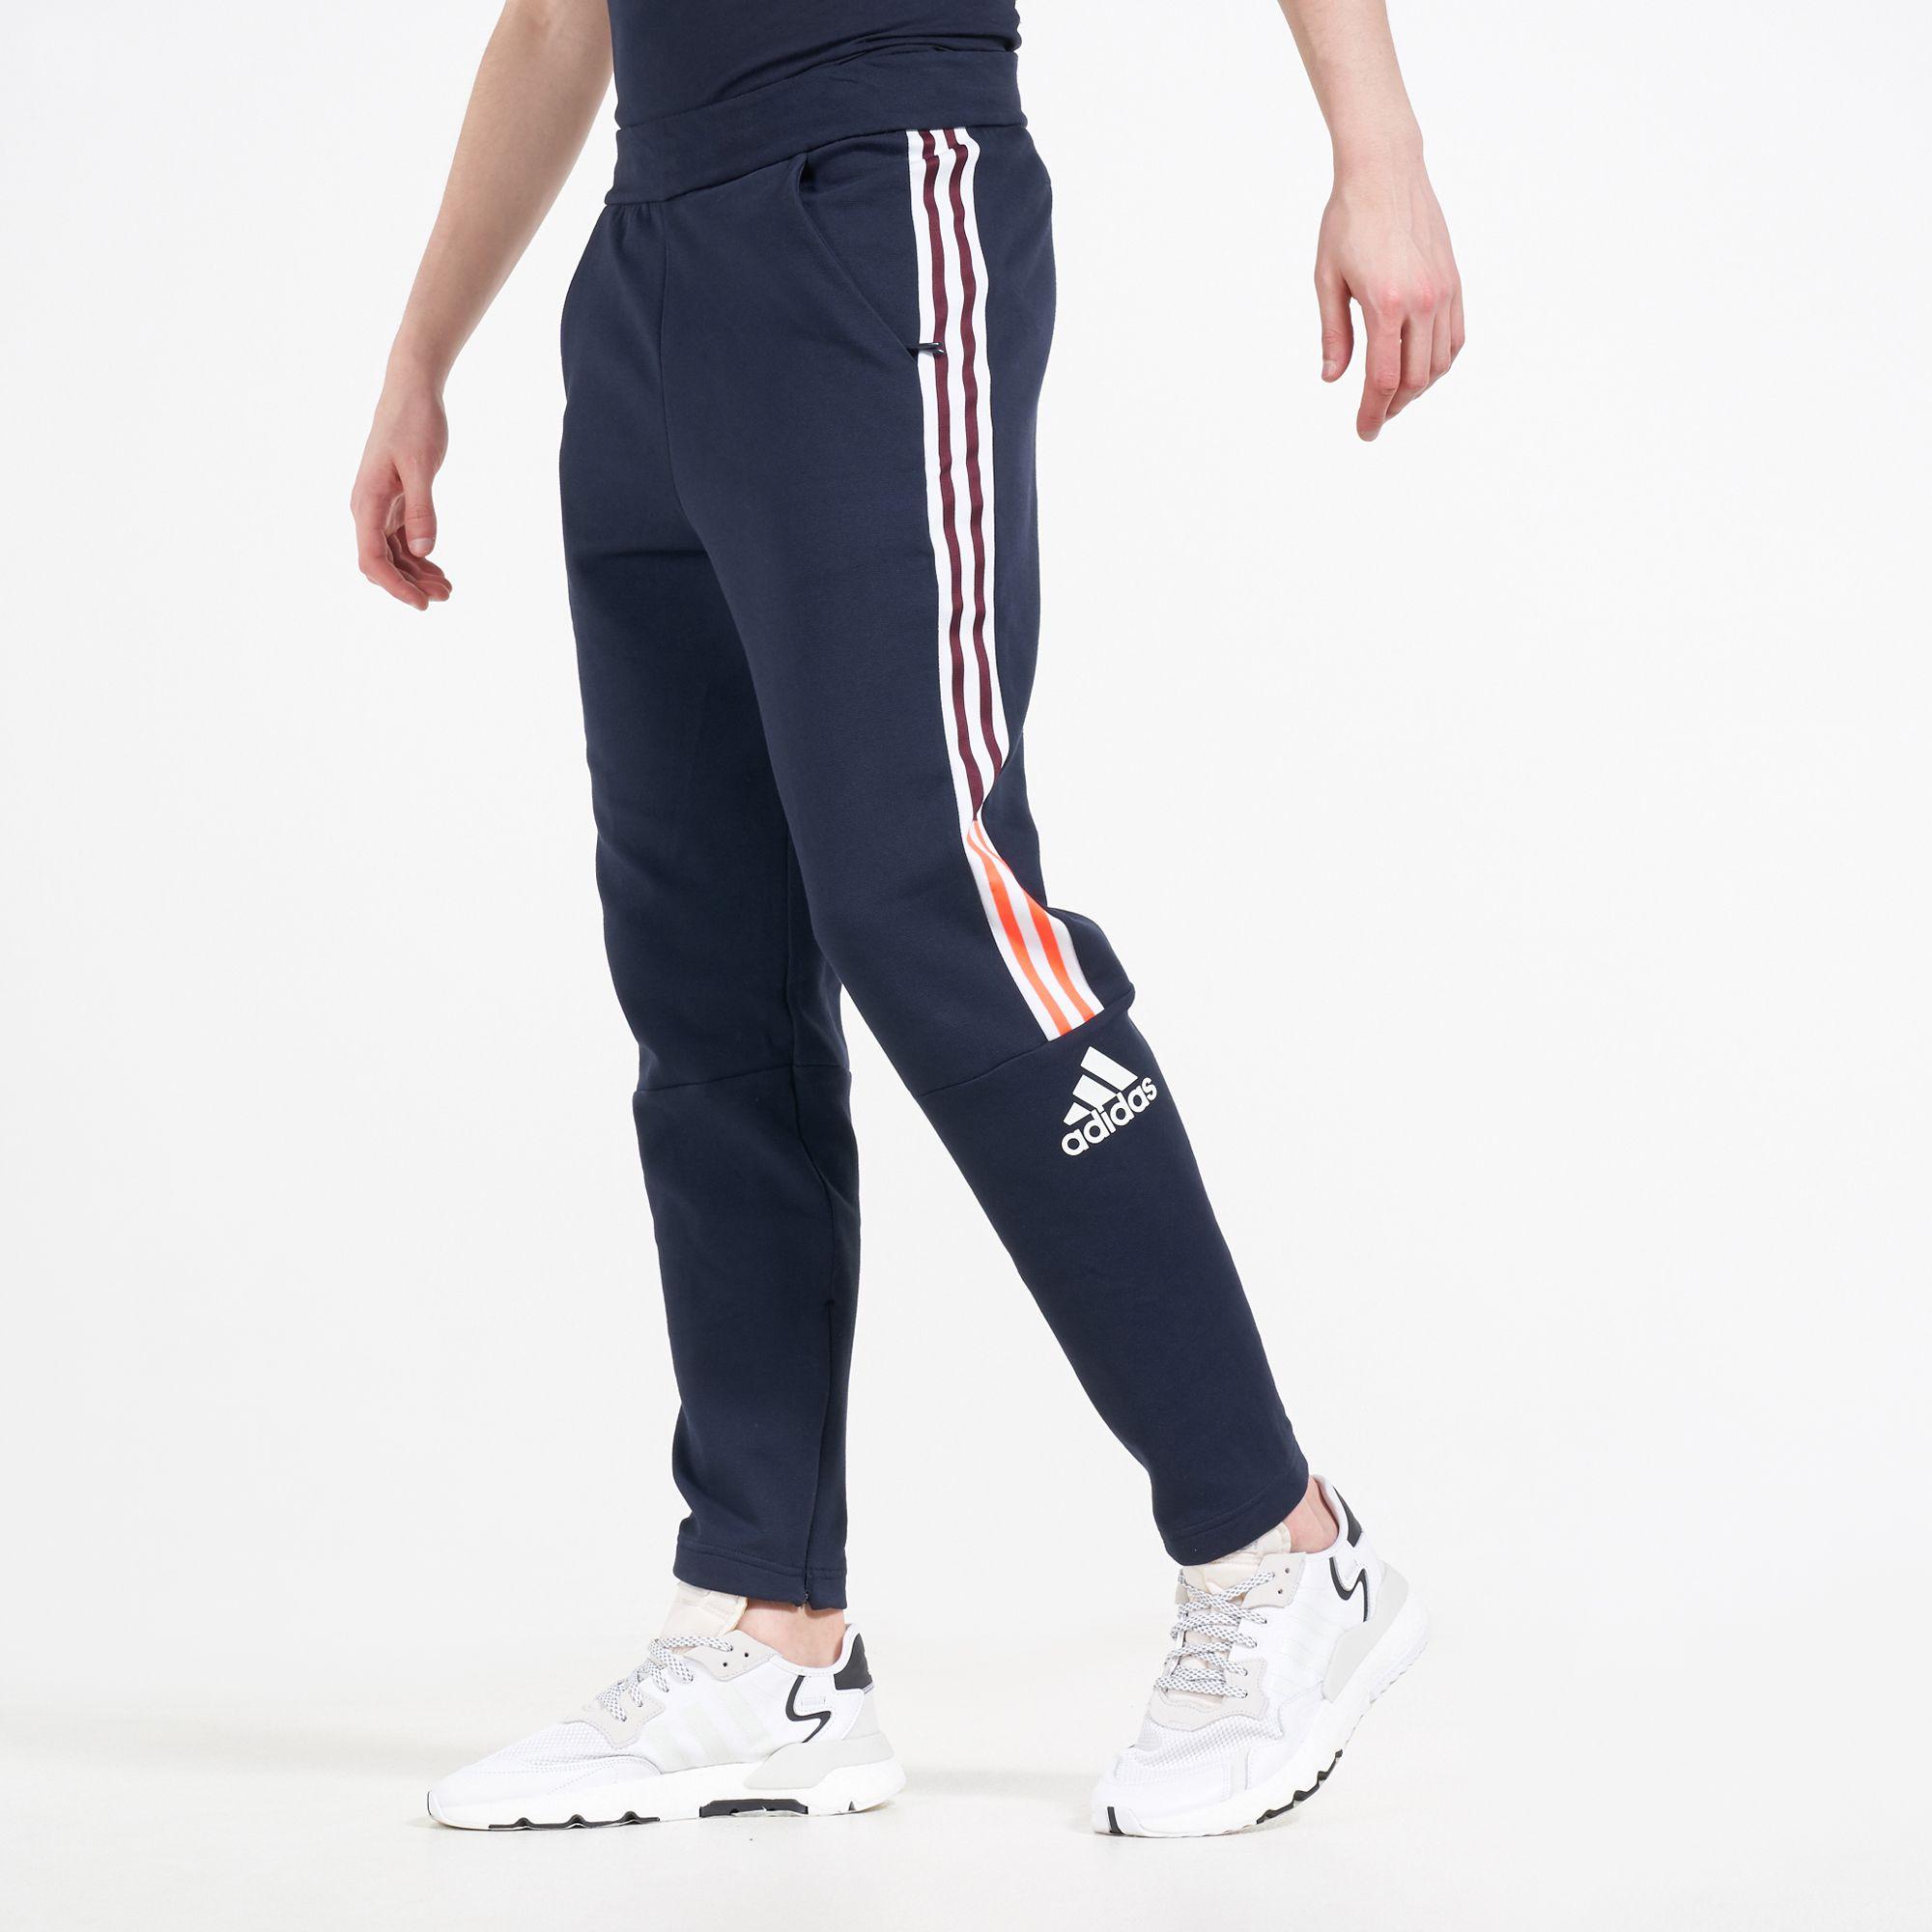 adidas zne 3 4 pants